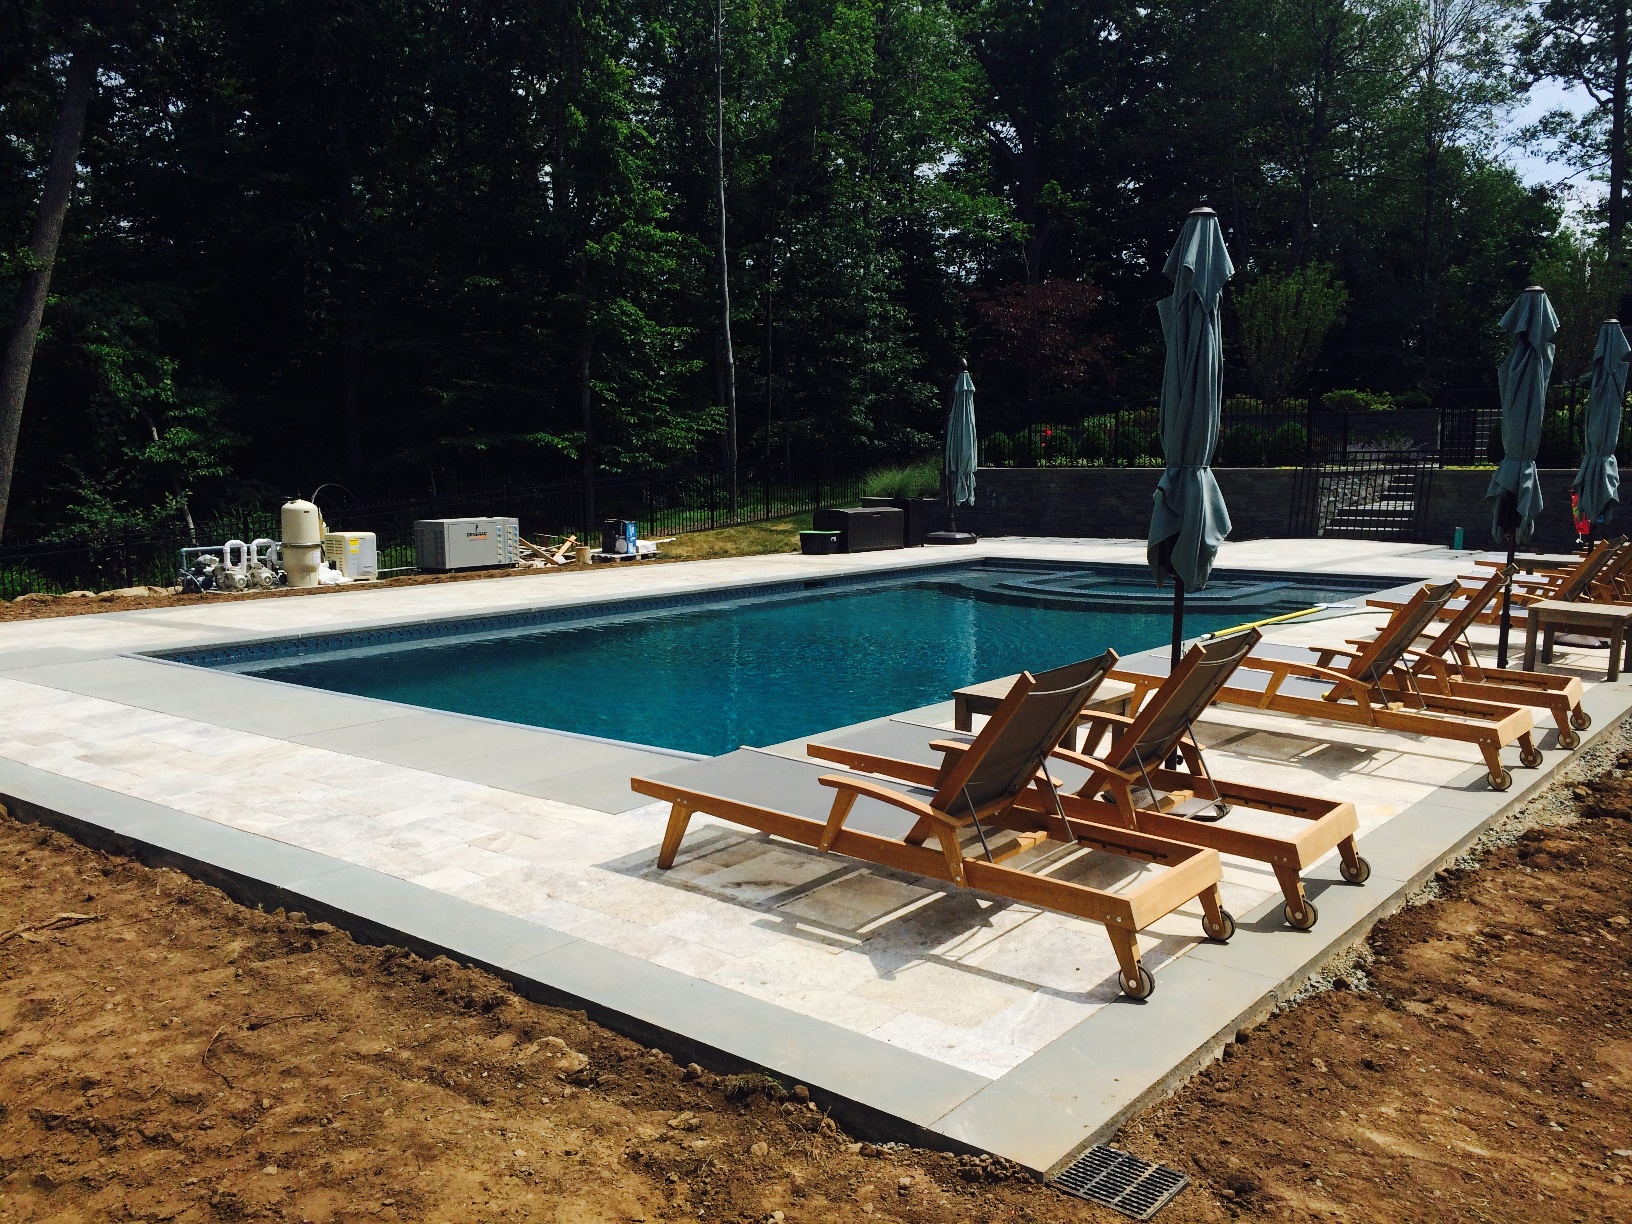 Pool Installation & 27kw Generac Residential Generator - Livingston, NJ